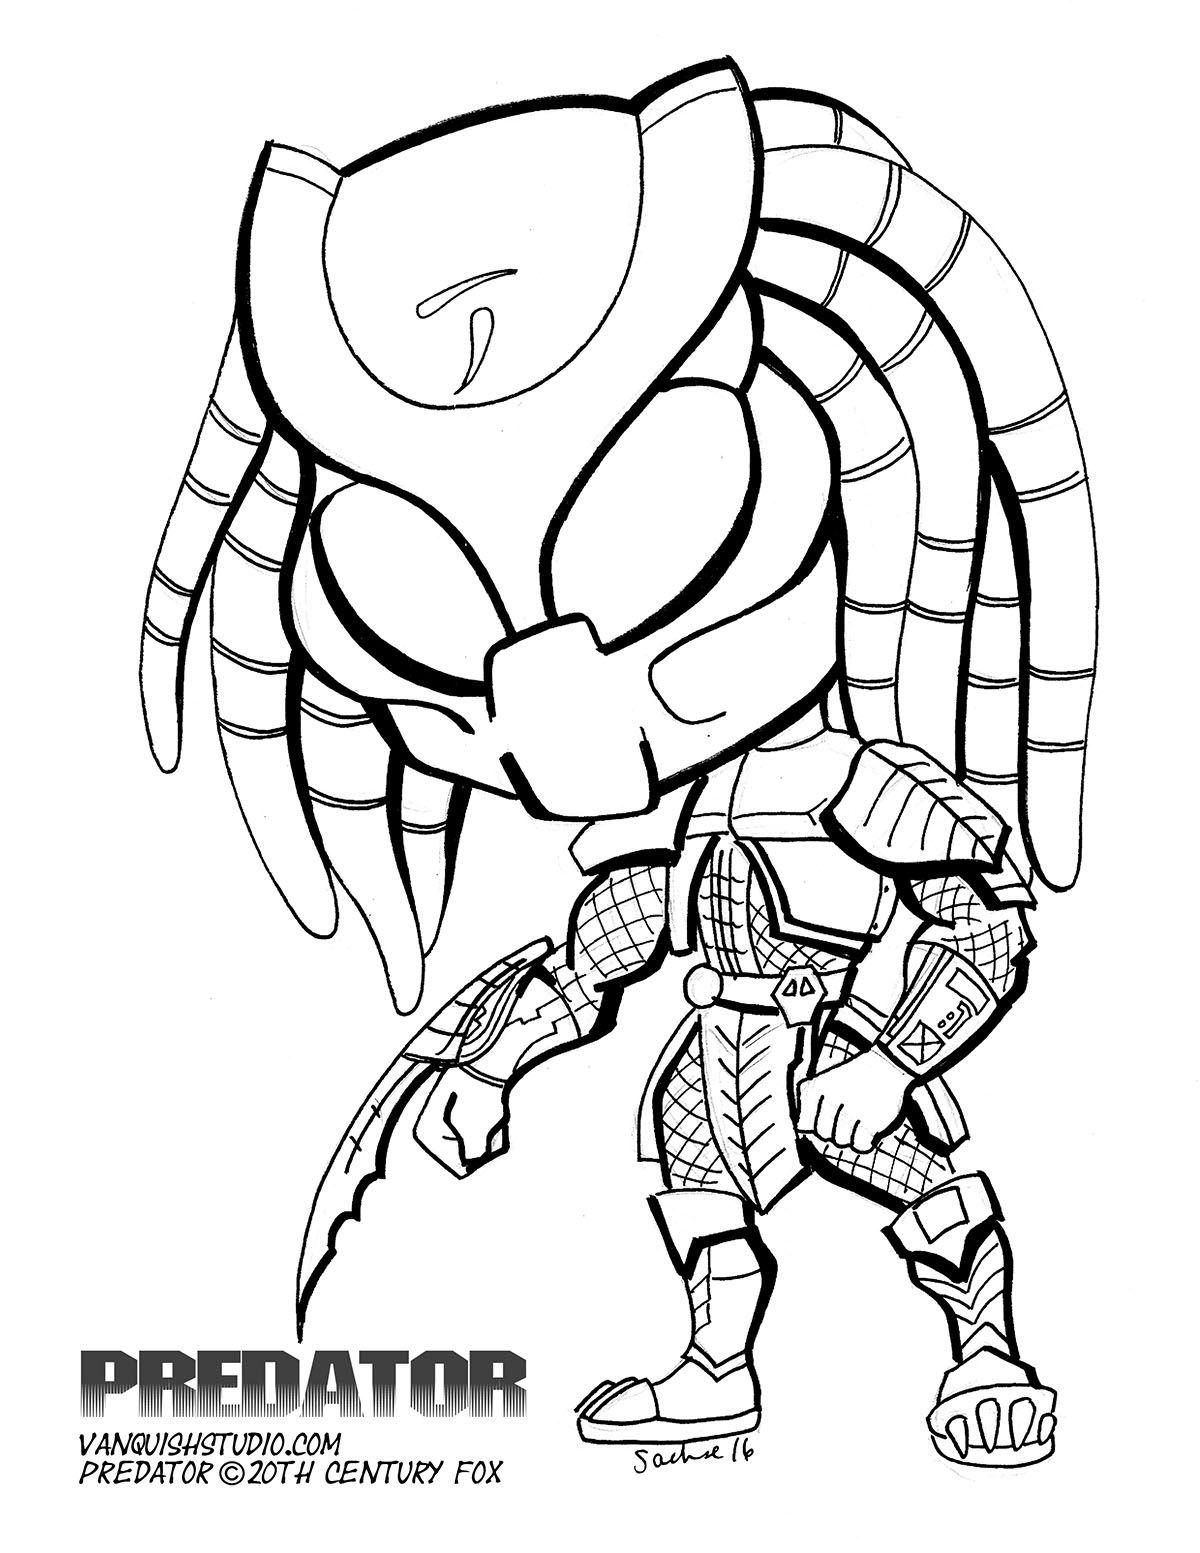 Predator Superhero Coloring Pages Cartoon Coloring Pages Superhero Coloring